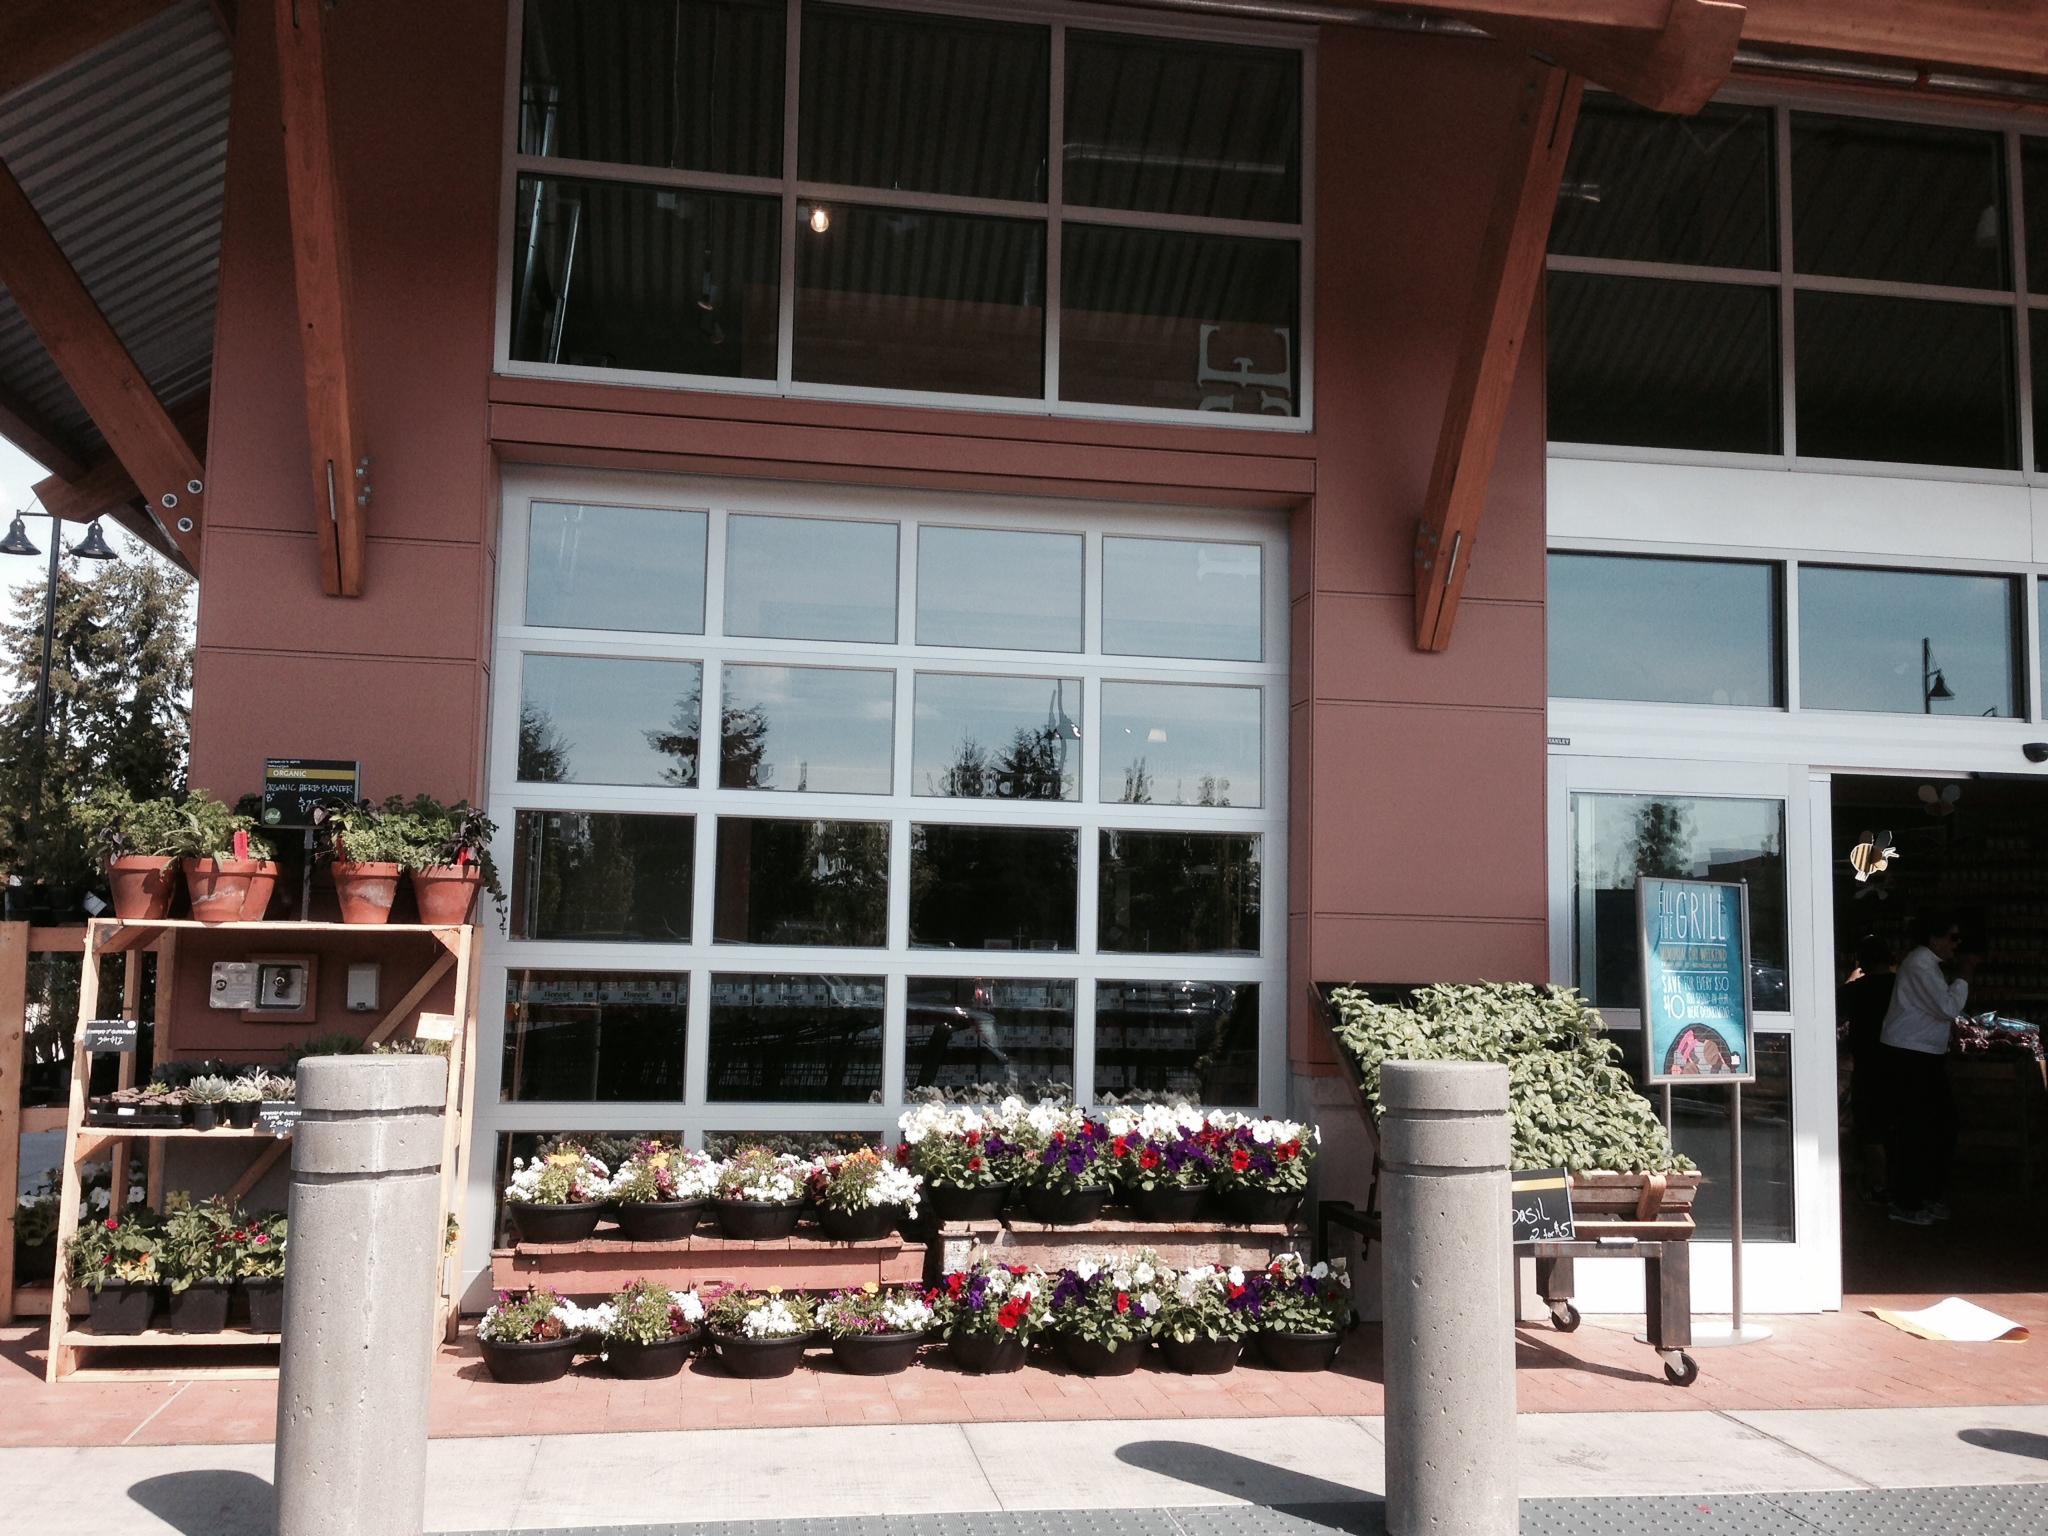 Whole Foods Commercial Project Northwest Door Service